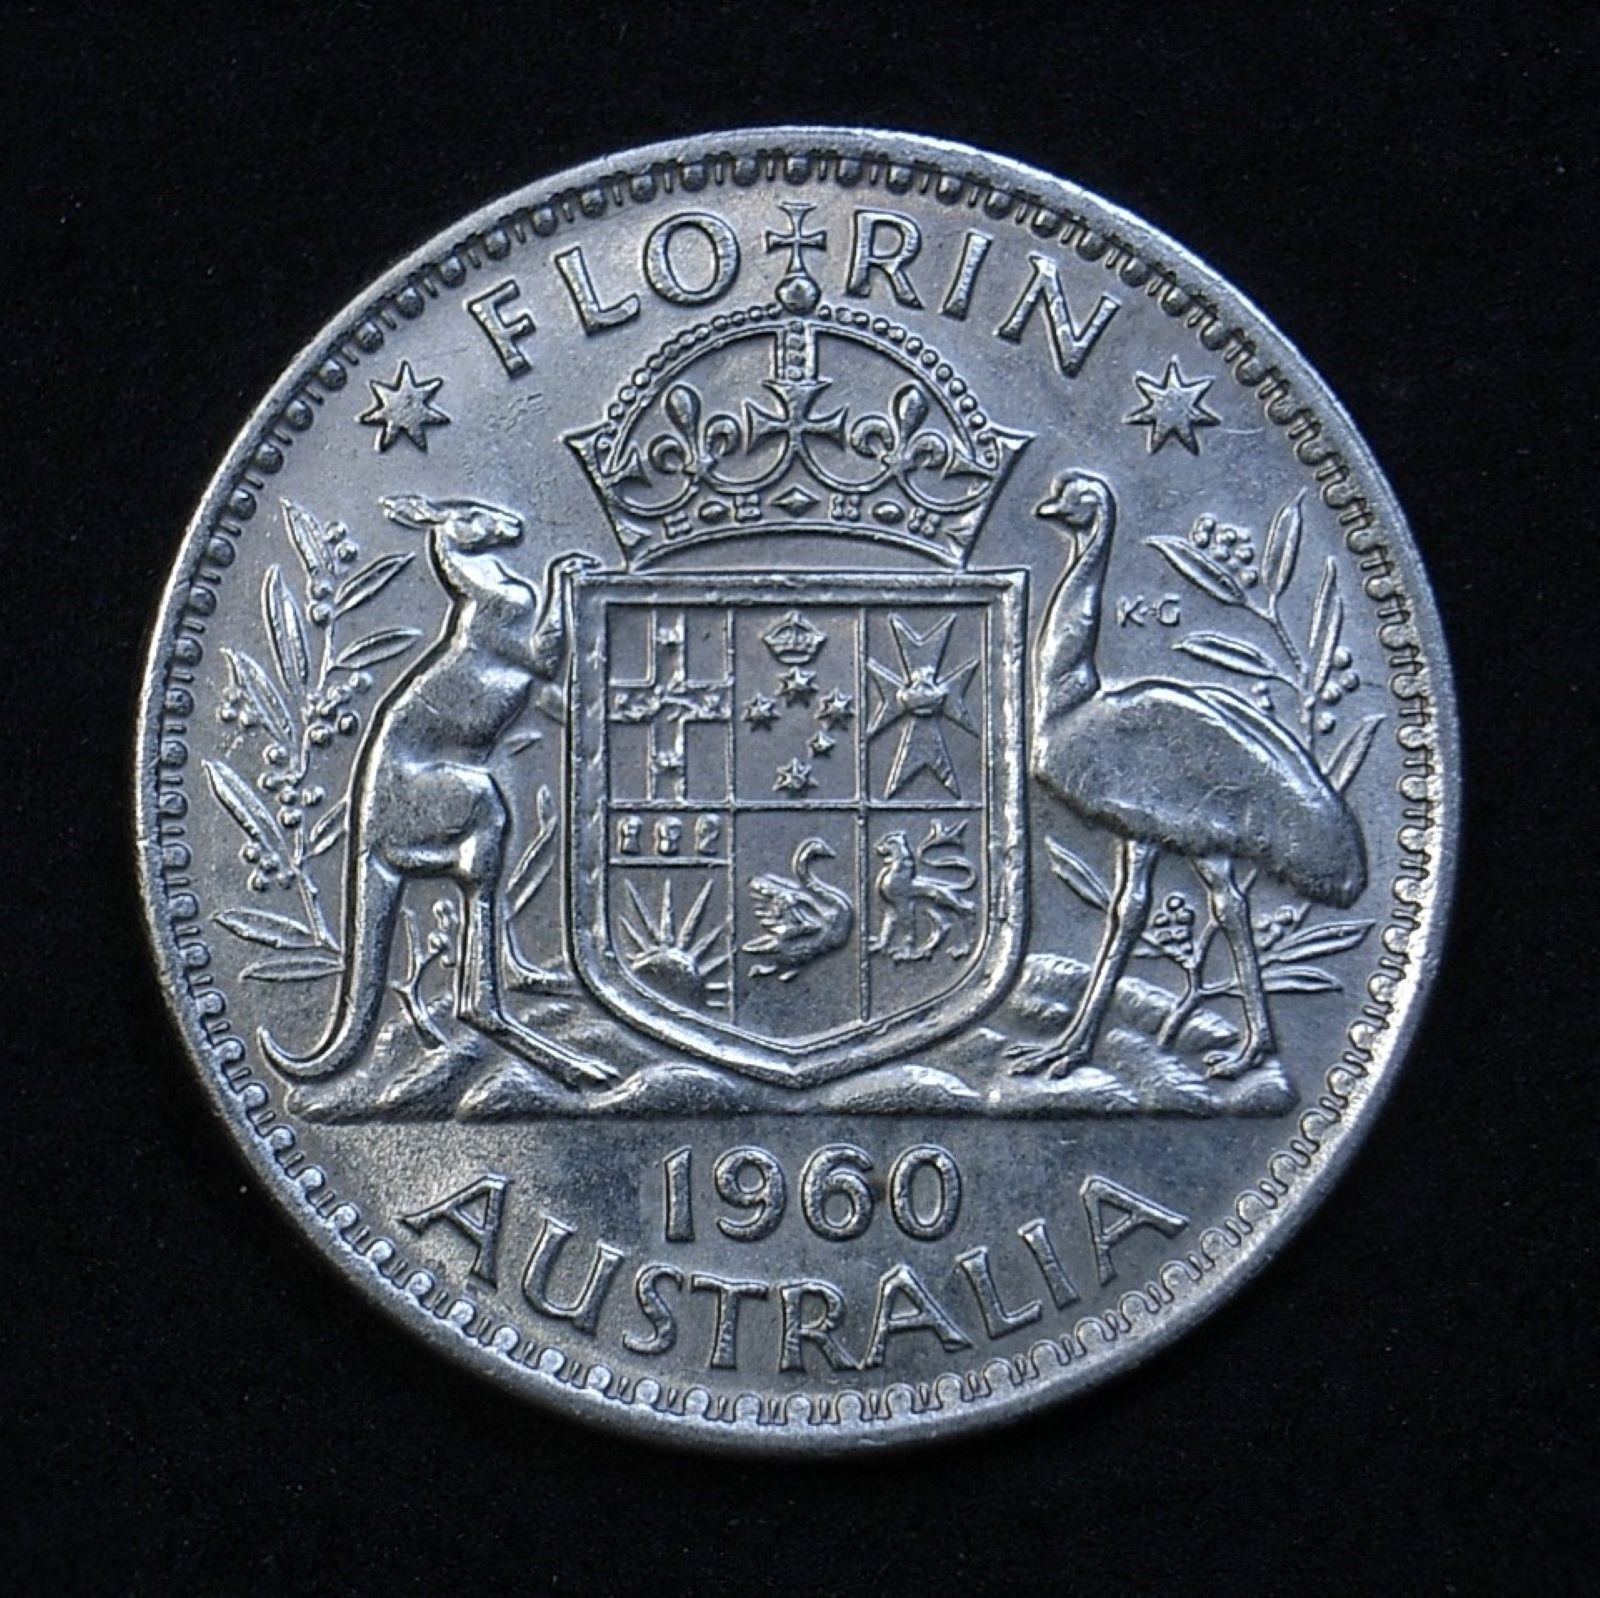 Aus Florin 1960 rev 1